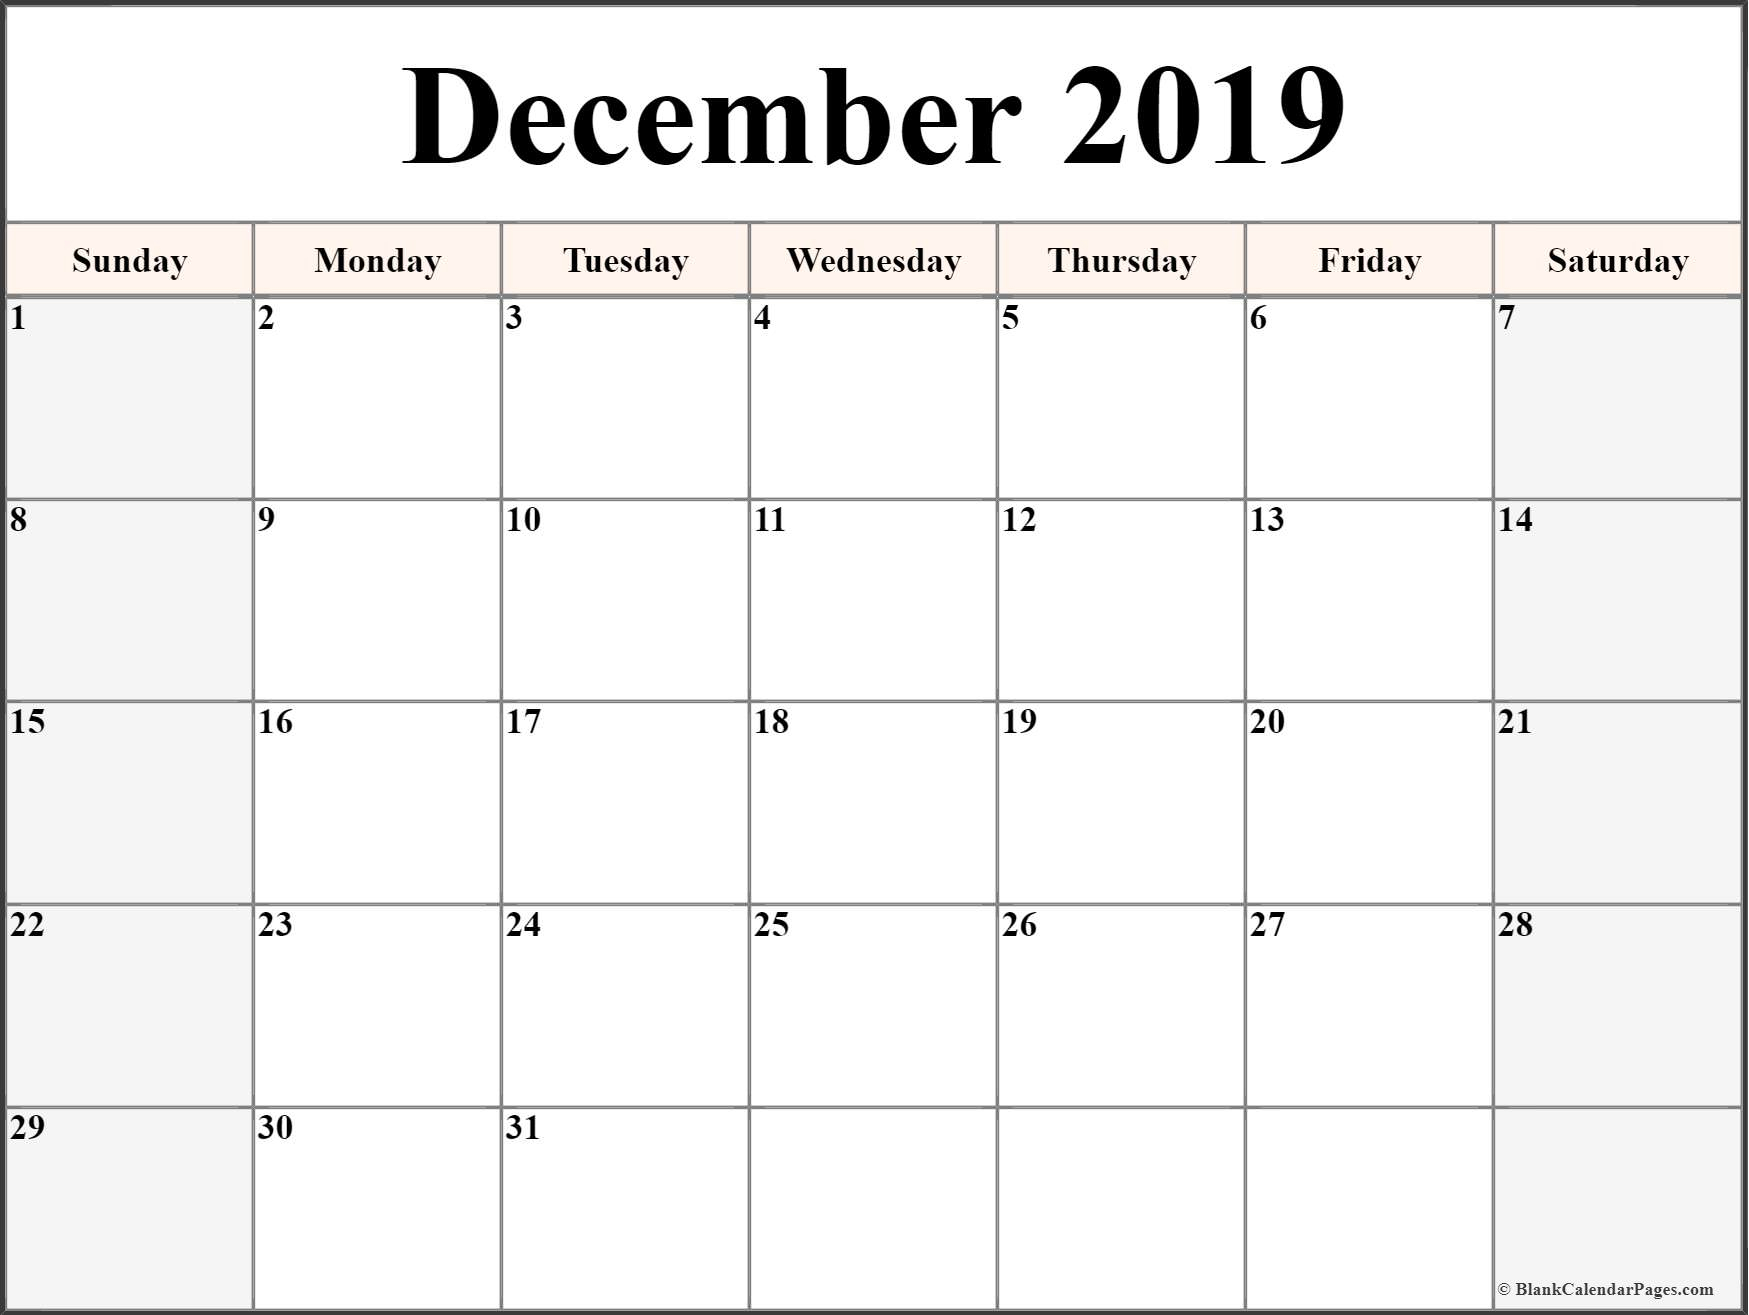 December 2019 Calendar | Free Printable Monthly Calendars with Blank Calendar Printable December